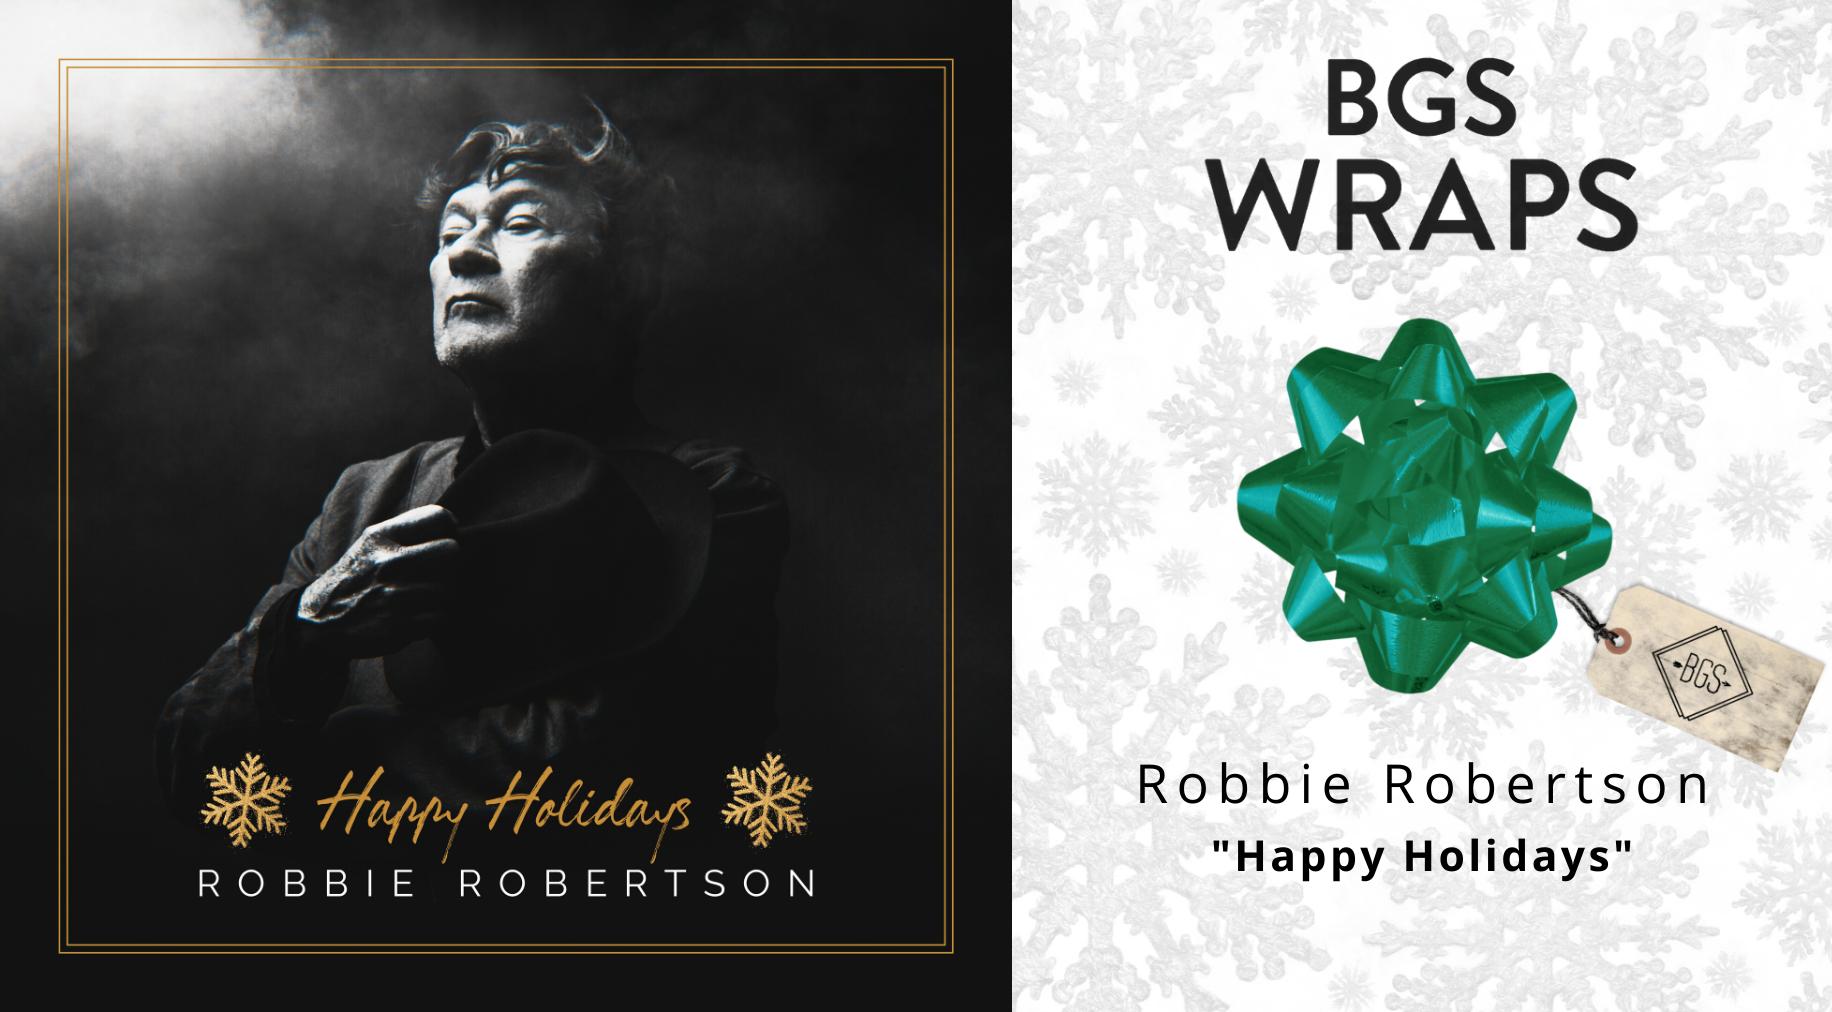 BGS WRAPS: Robbie Robertson,